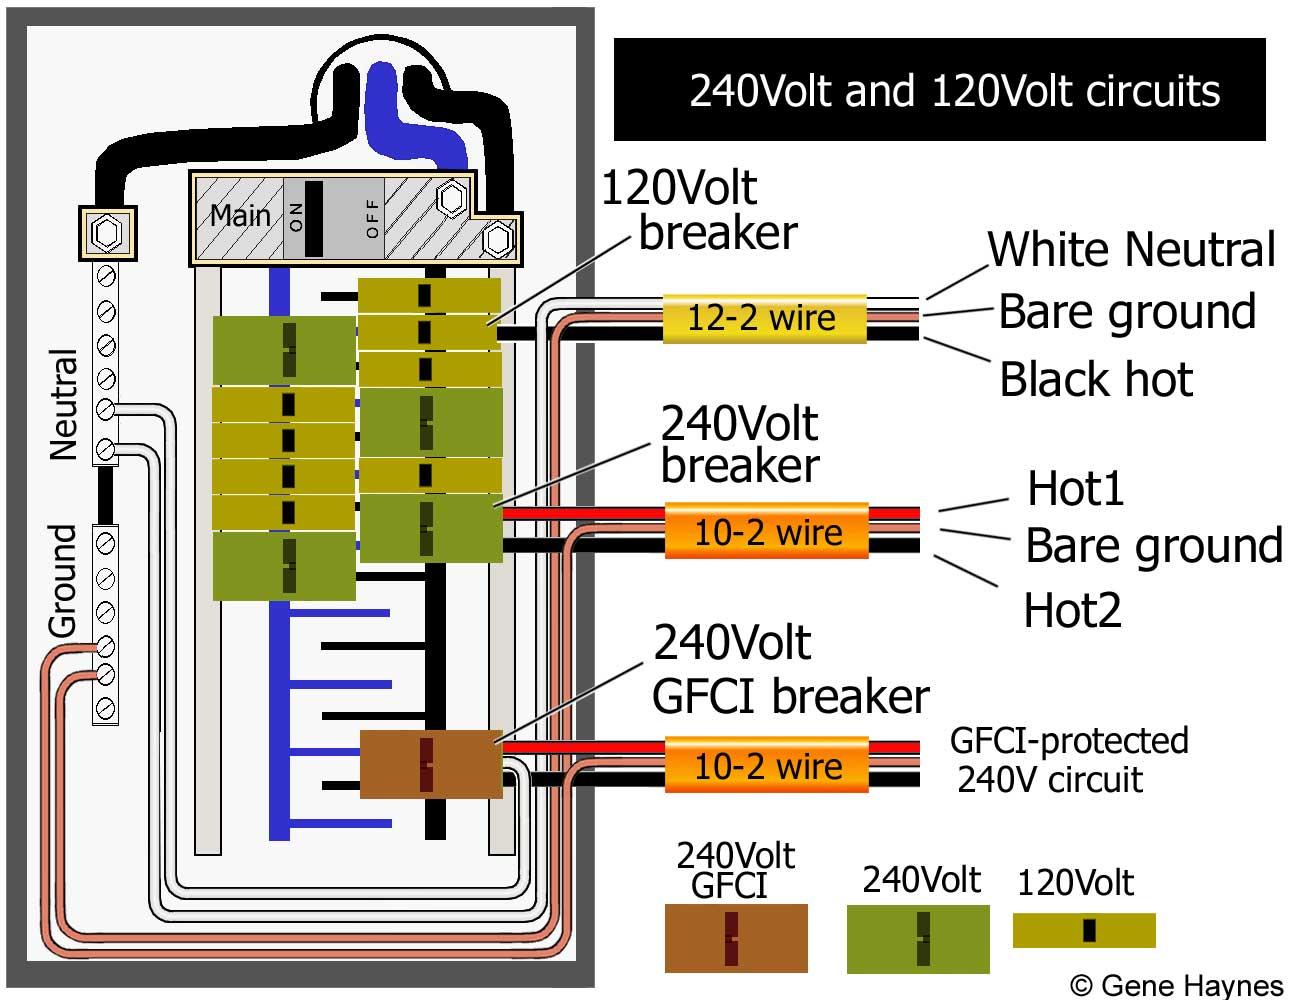 120 Volt Gfci Breaker Wiring Diagram | Wiring Diagram - 2 Pole Gfci Breaker Wiring Diagram